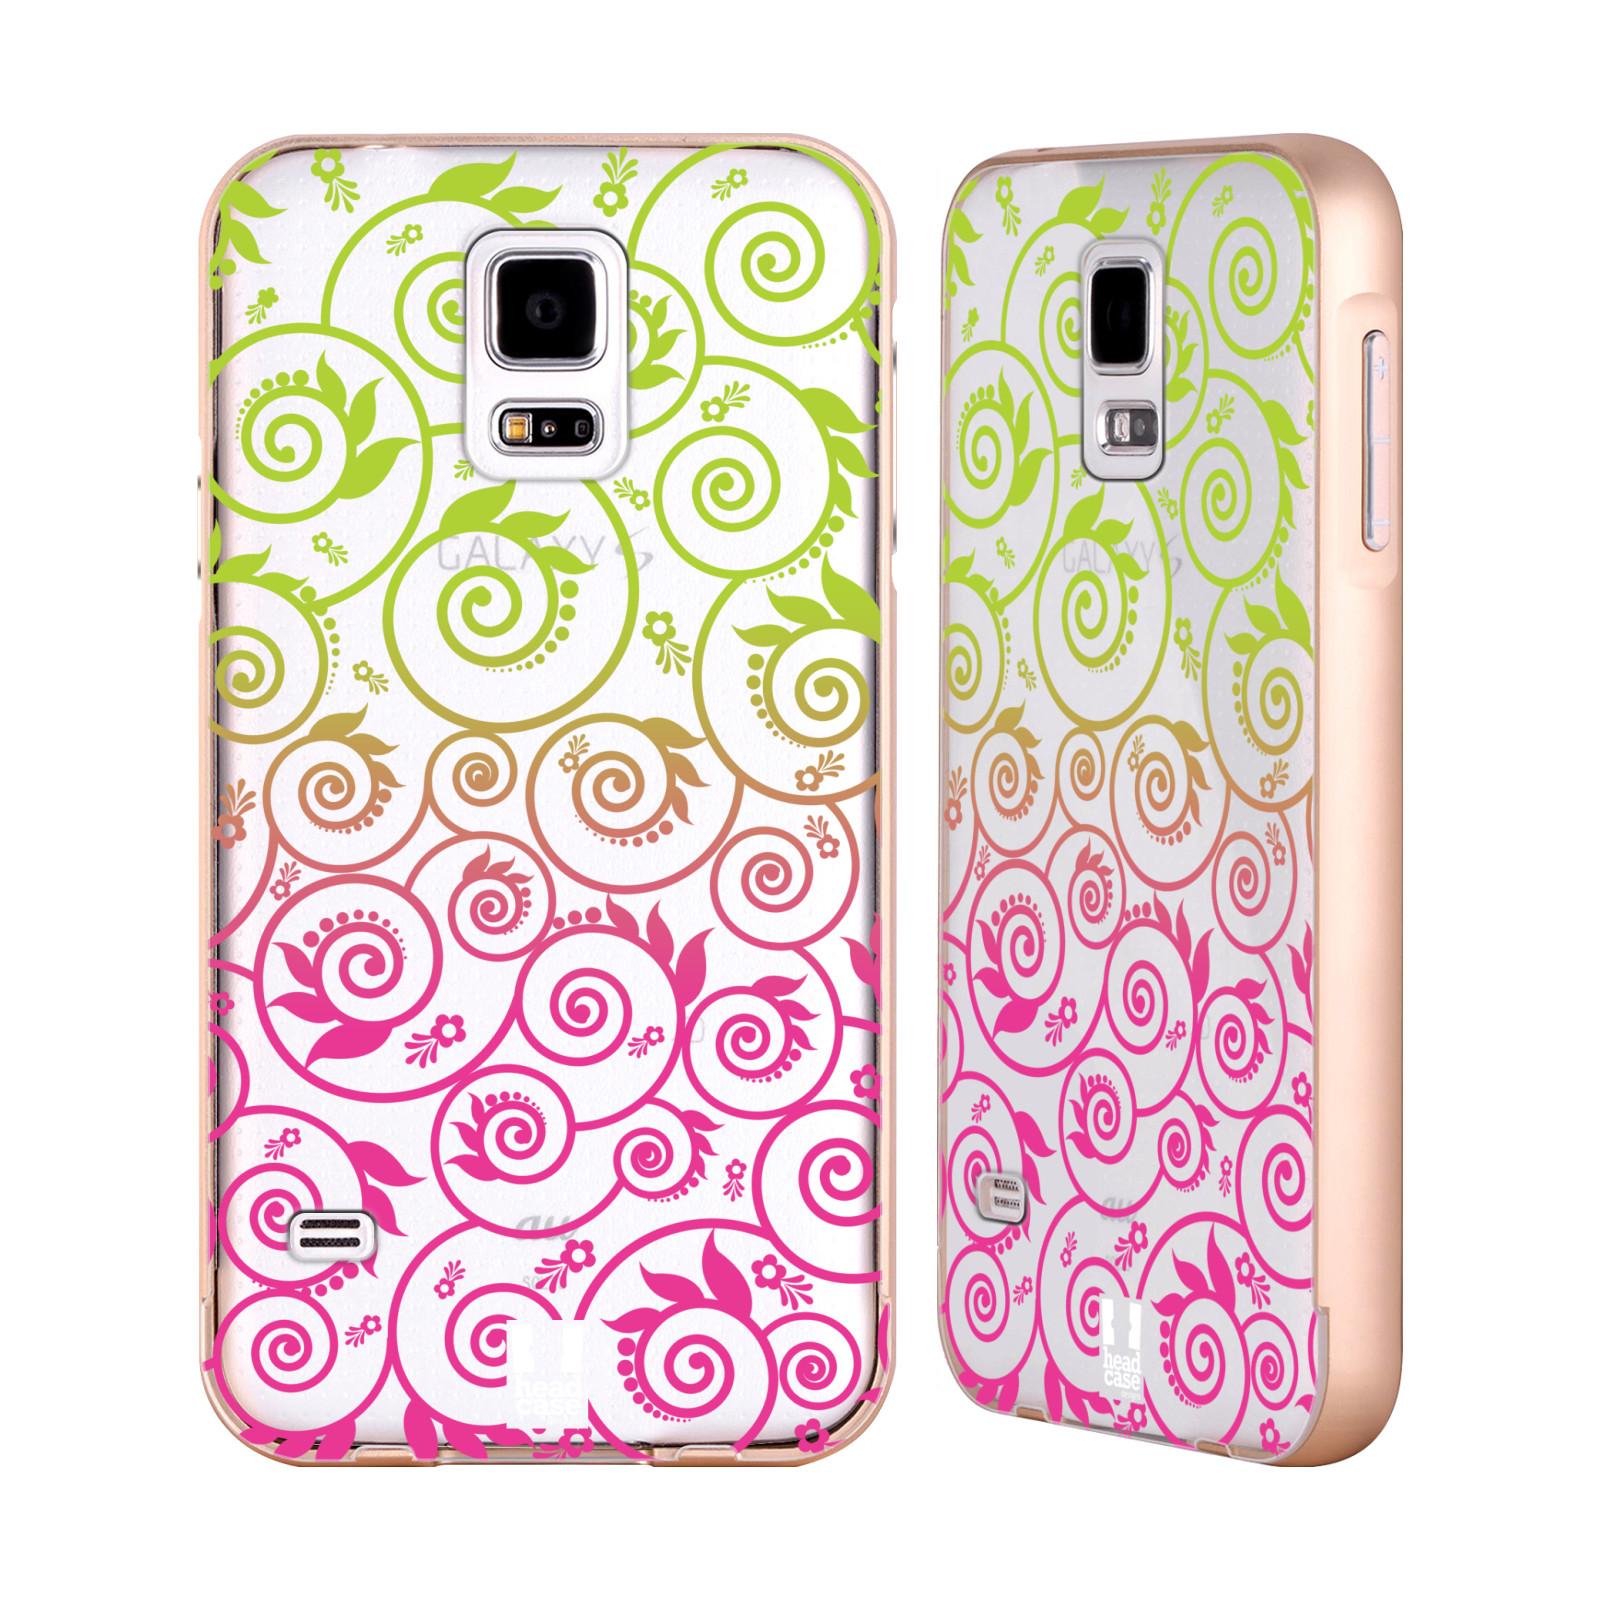 HEAD-CASE-DESIGNS-NEON-OMBRE-FILIGREE-GOLD-BUMPER-SLIDER-CASE-FOR-SAMSUNG-PHONES